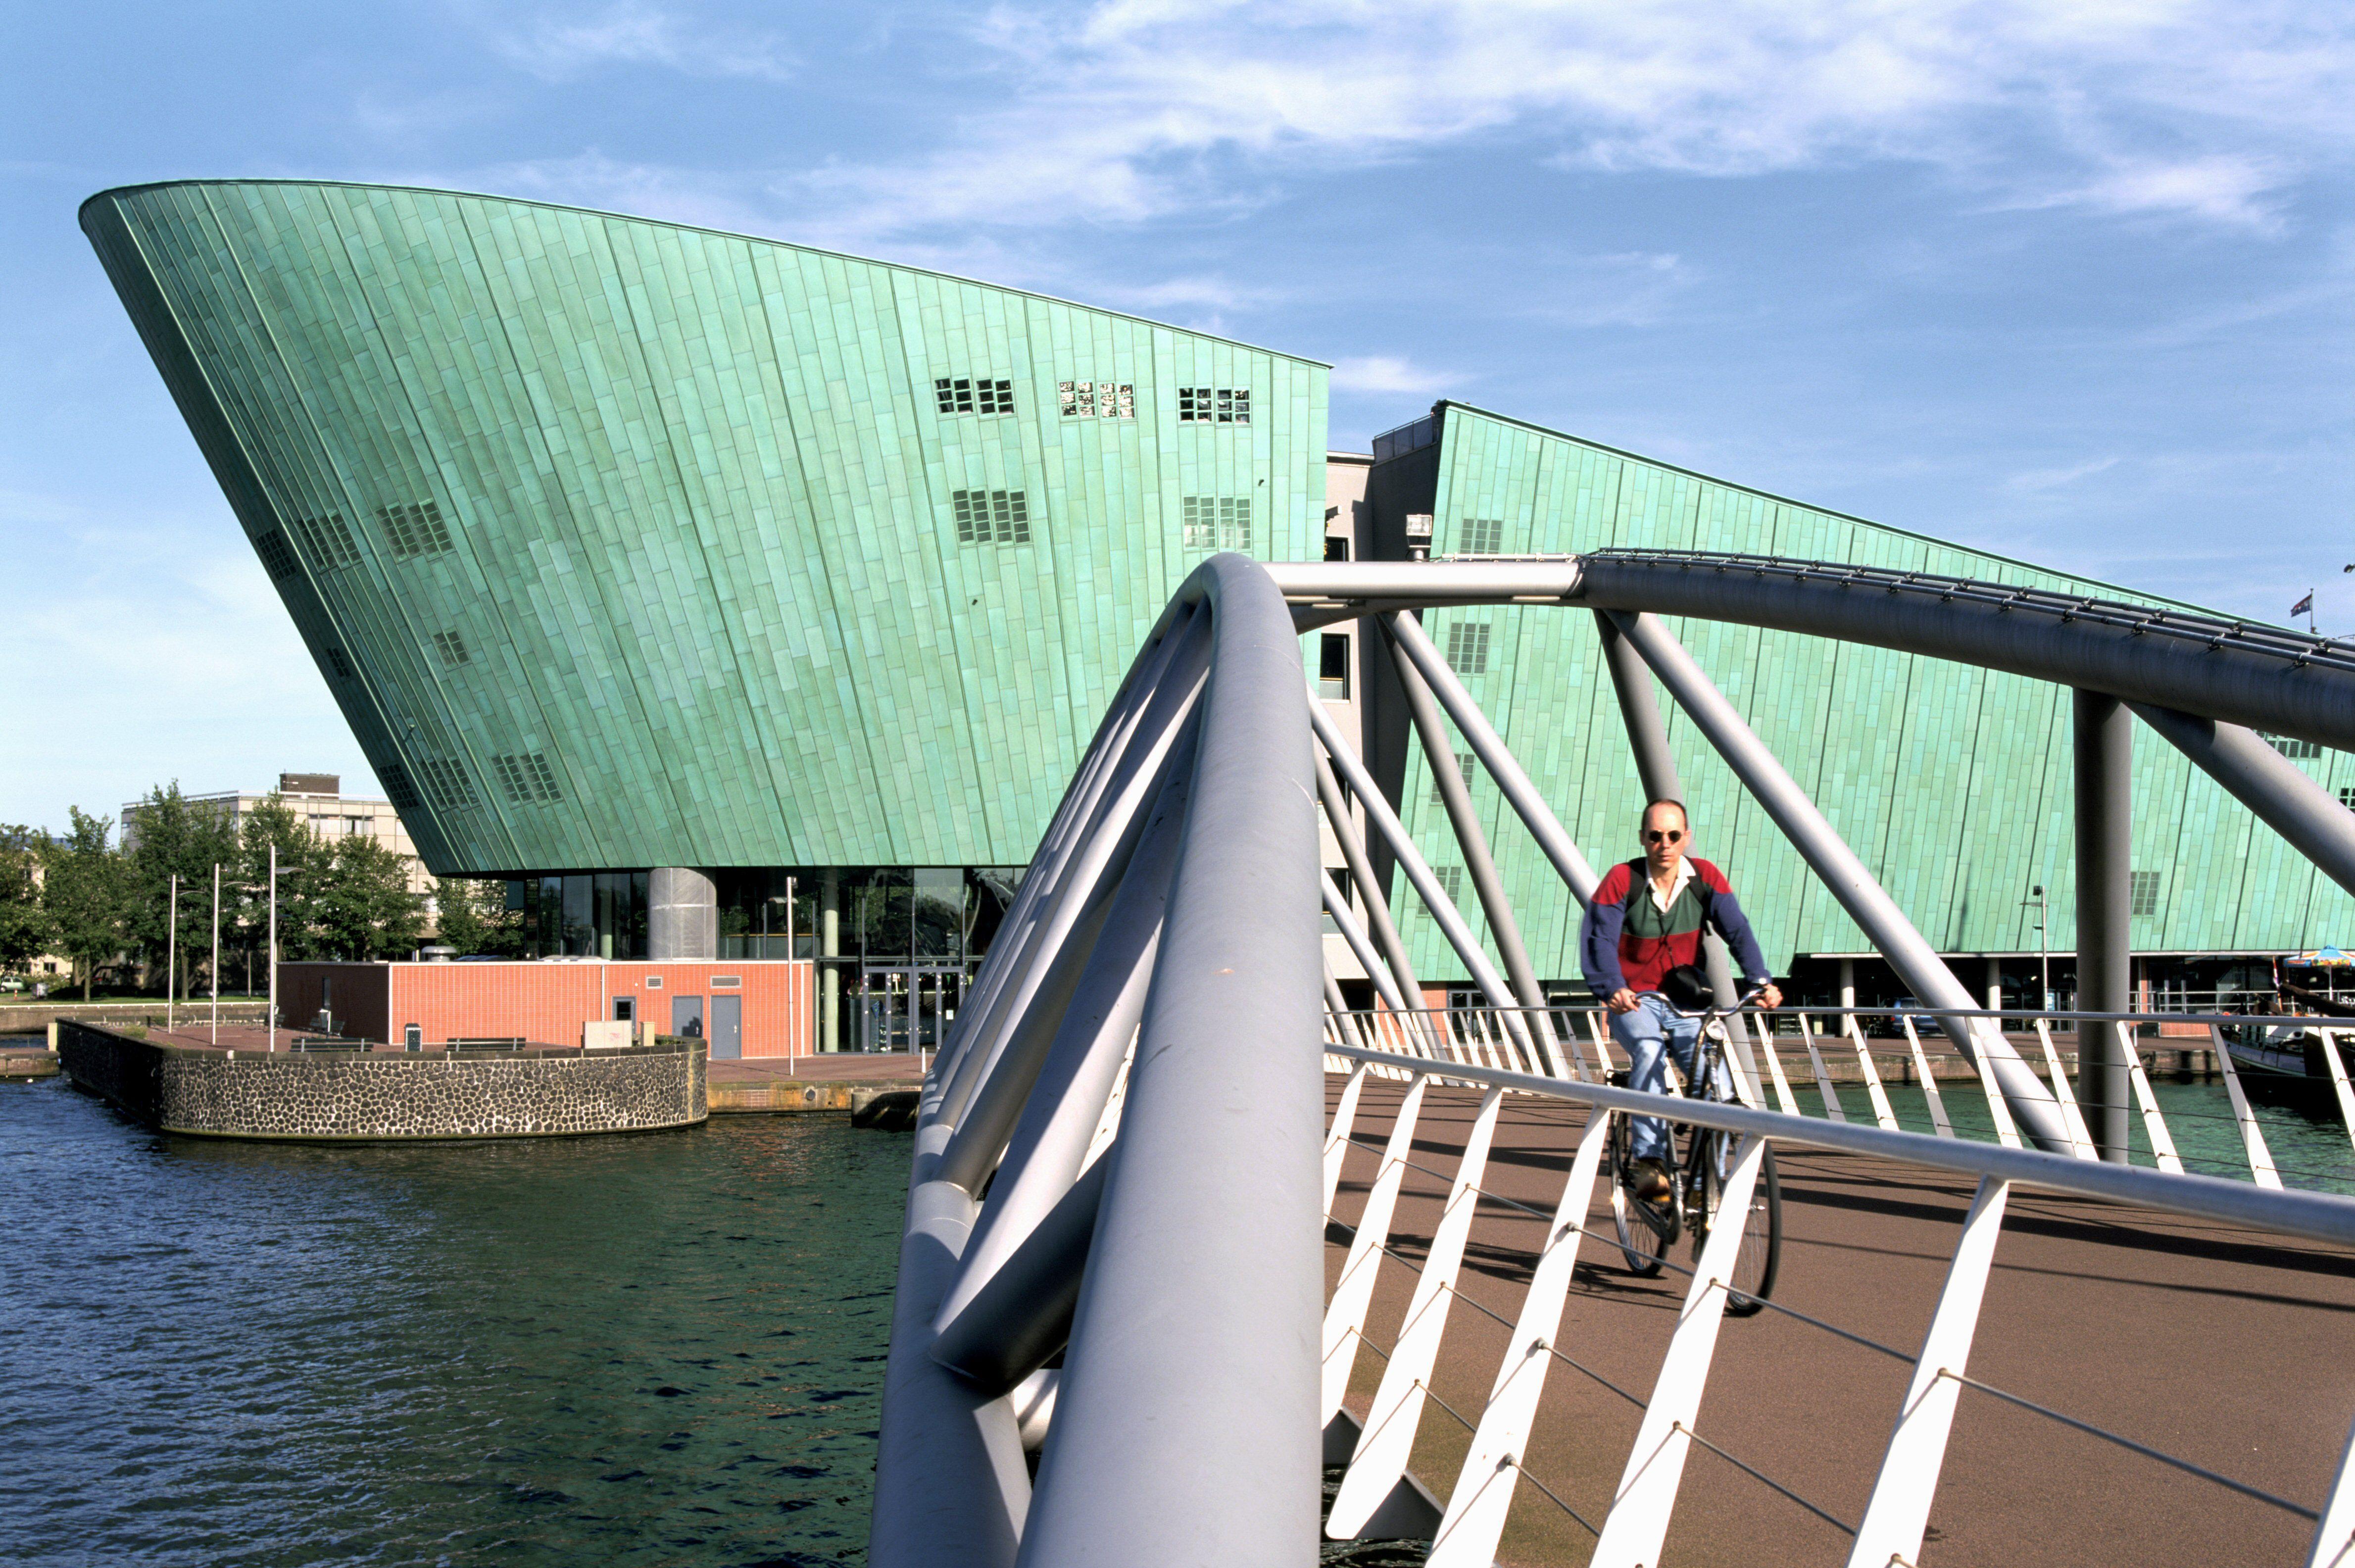 man on bicycle cross small bridge to asymmetrical blob-like green ship-like structure